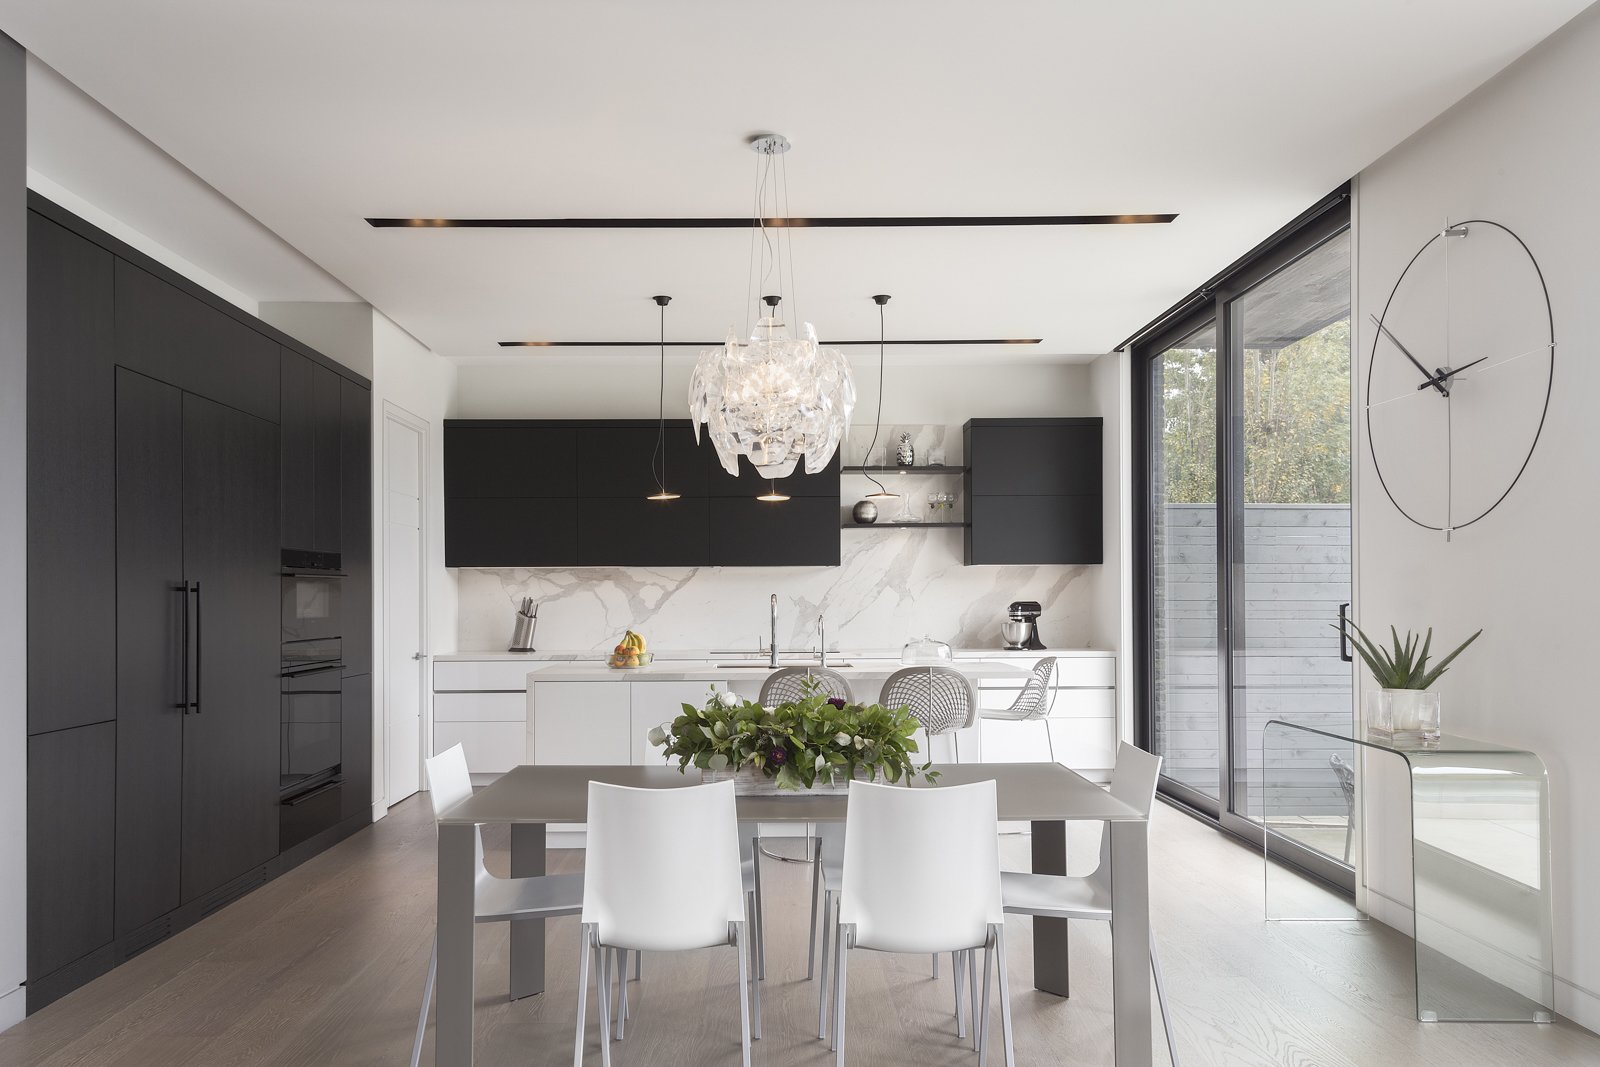 Kitchen, Light Hardwood Floor, Pendant Lighting, Drop In Sink, and Wood Cabinet Kitchen  IN House